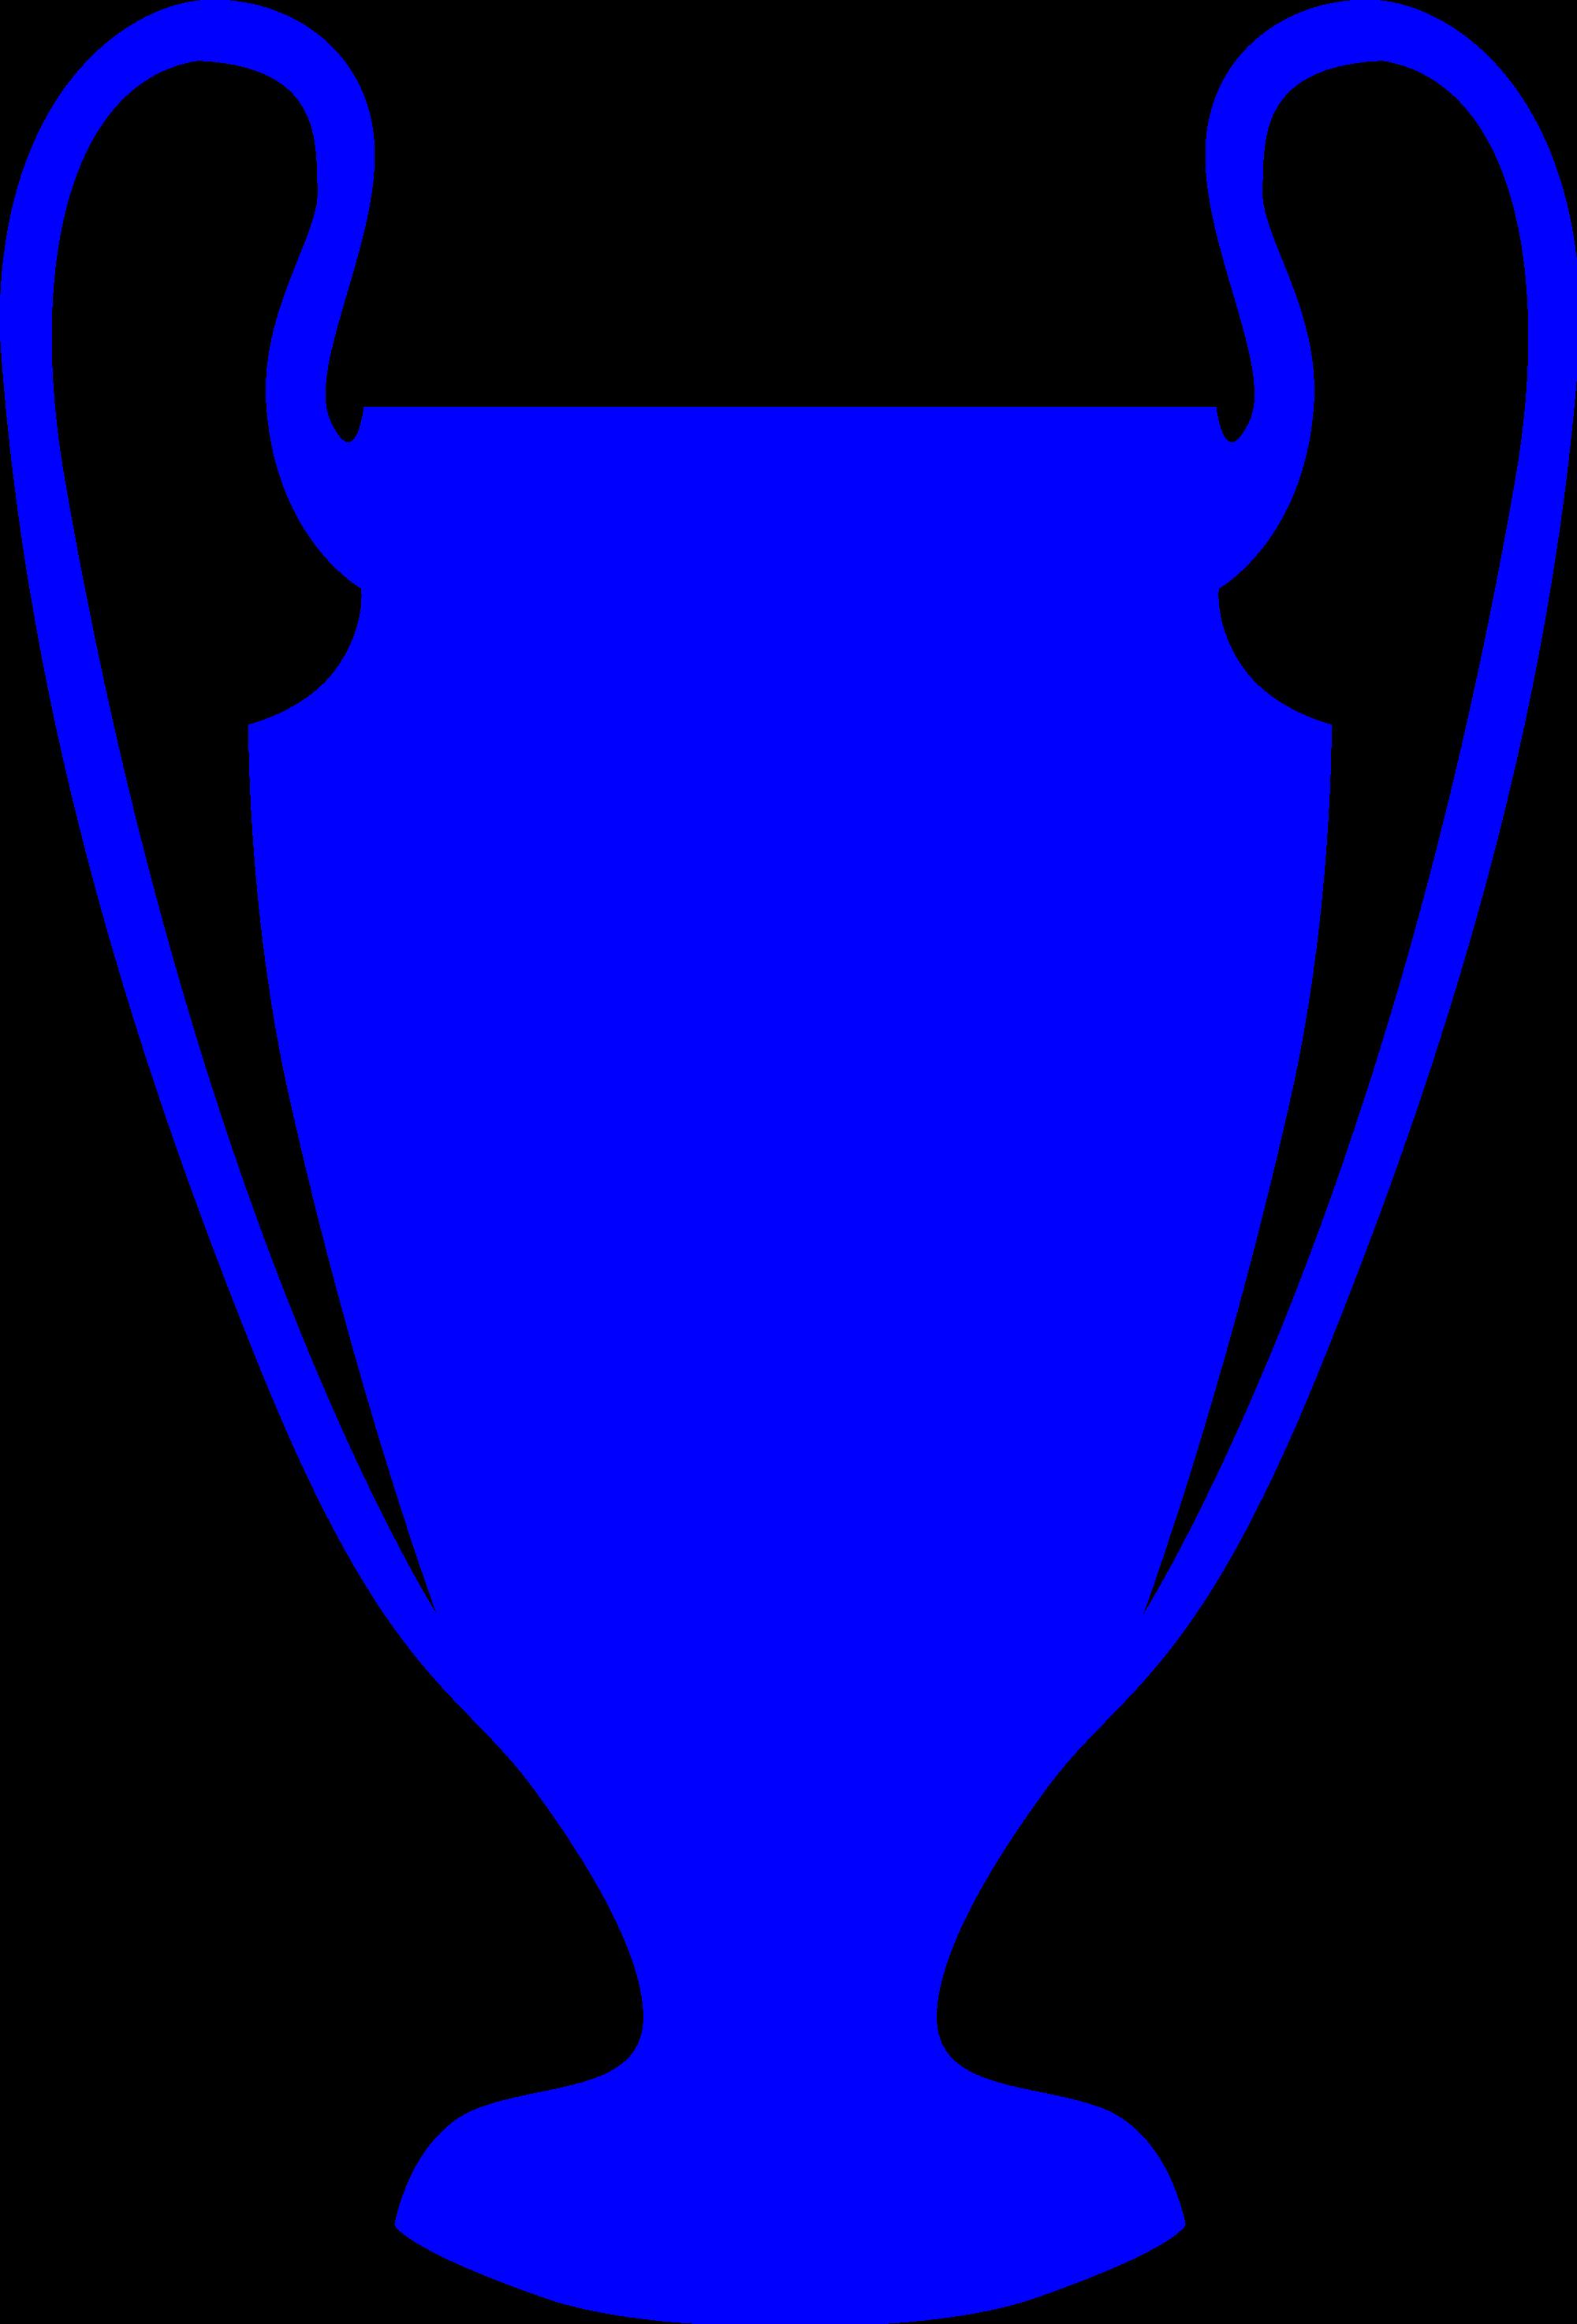 Clip Art Freeuse File Championsleague Svg Wikimedia.